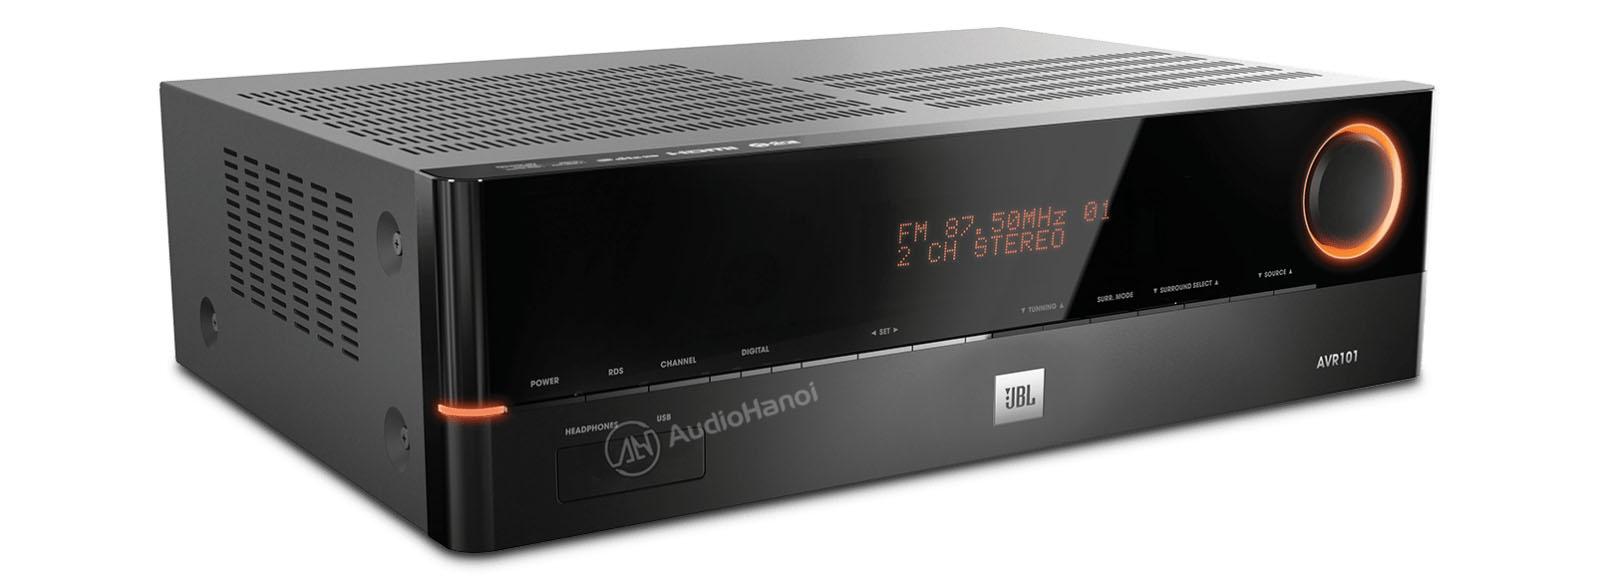 Ampli Harman Kardon AVR 101